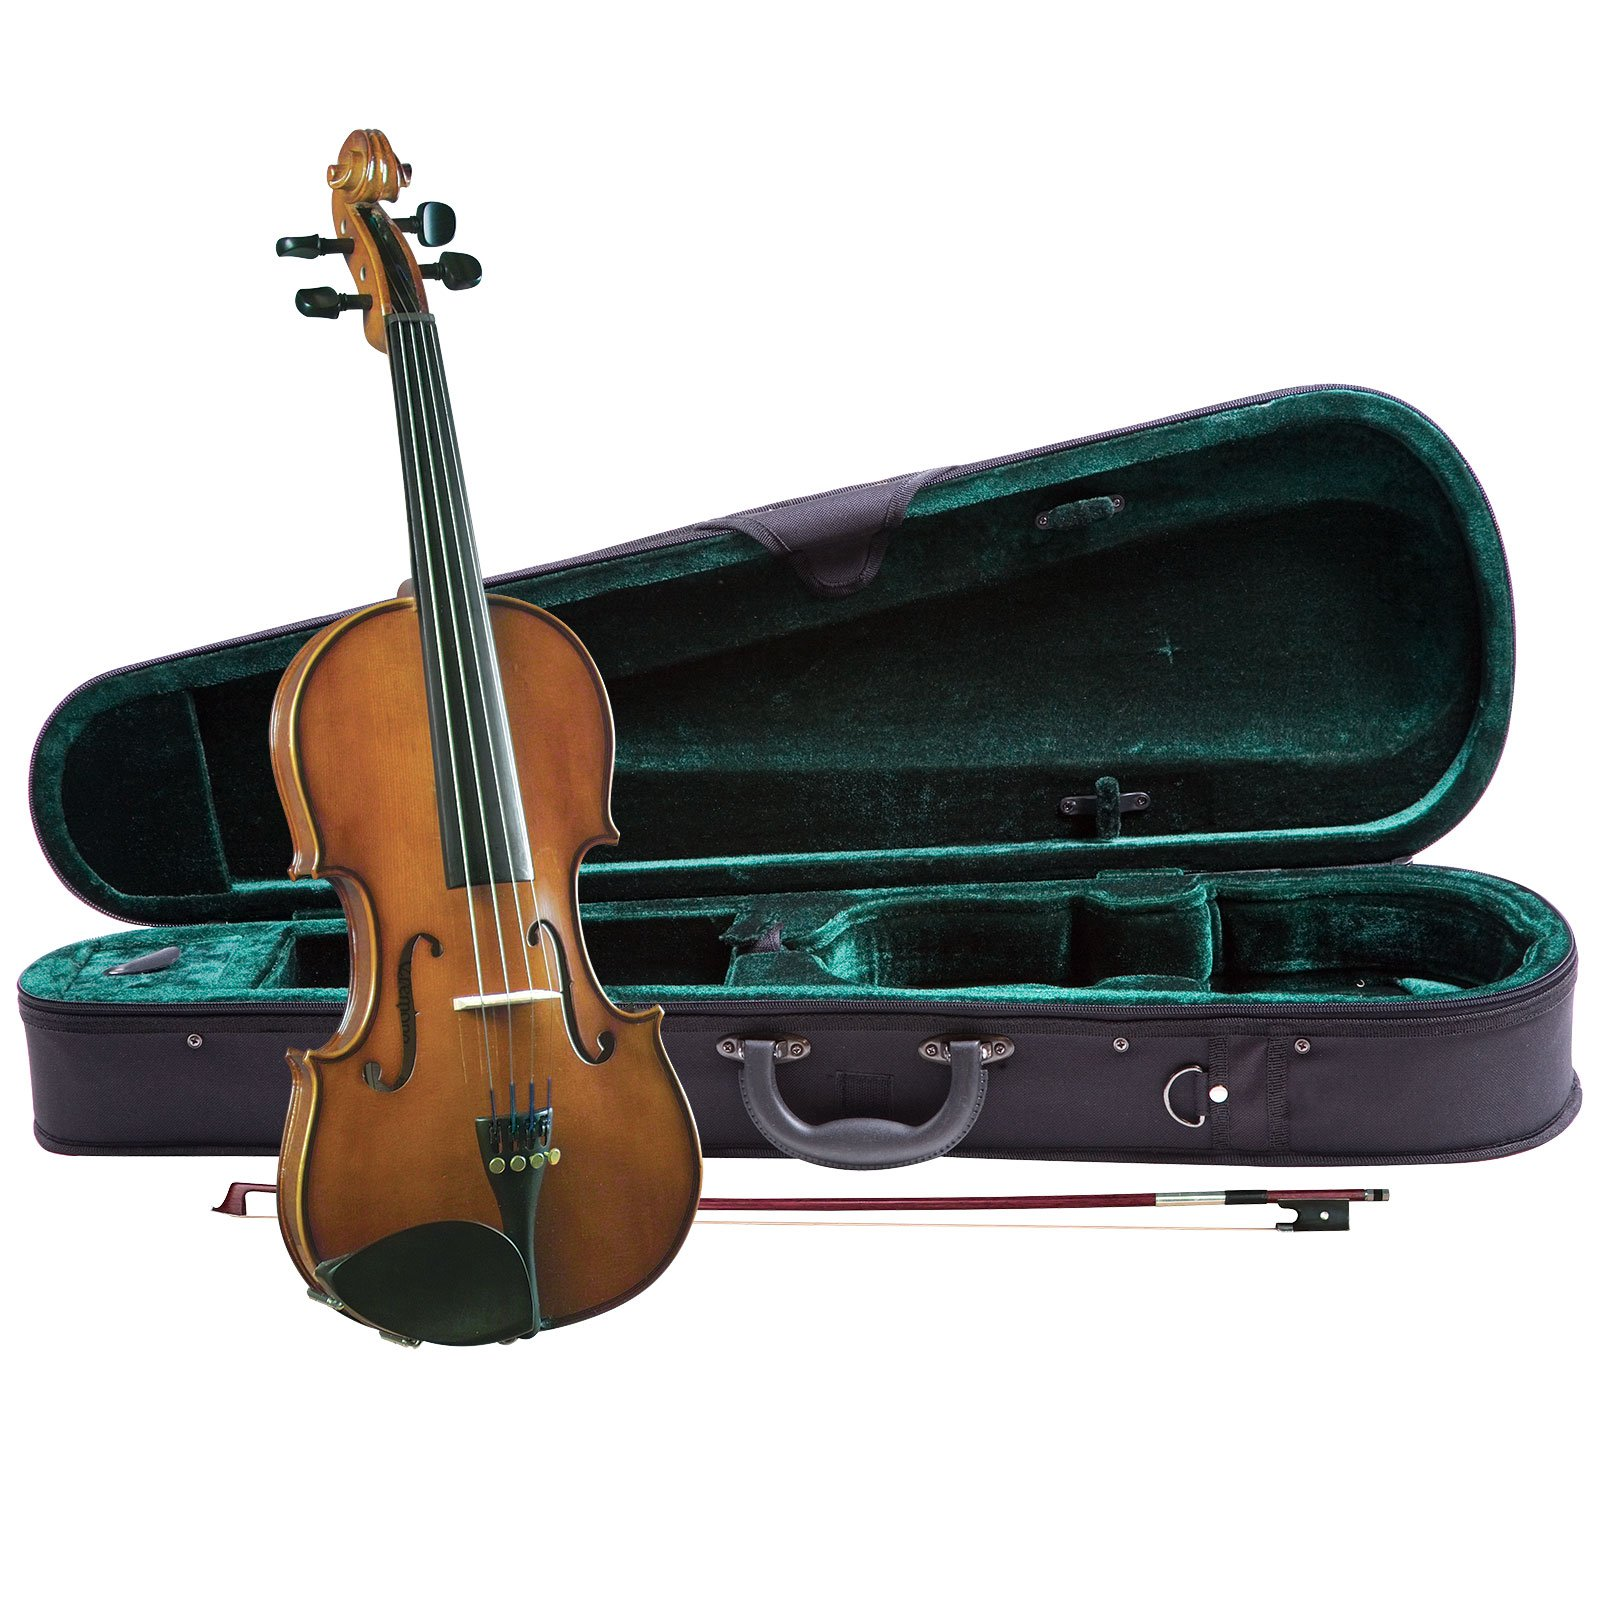 Cremona SV-130 Premier Novice Violin Outfit - 1/4 Size by Cremona